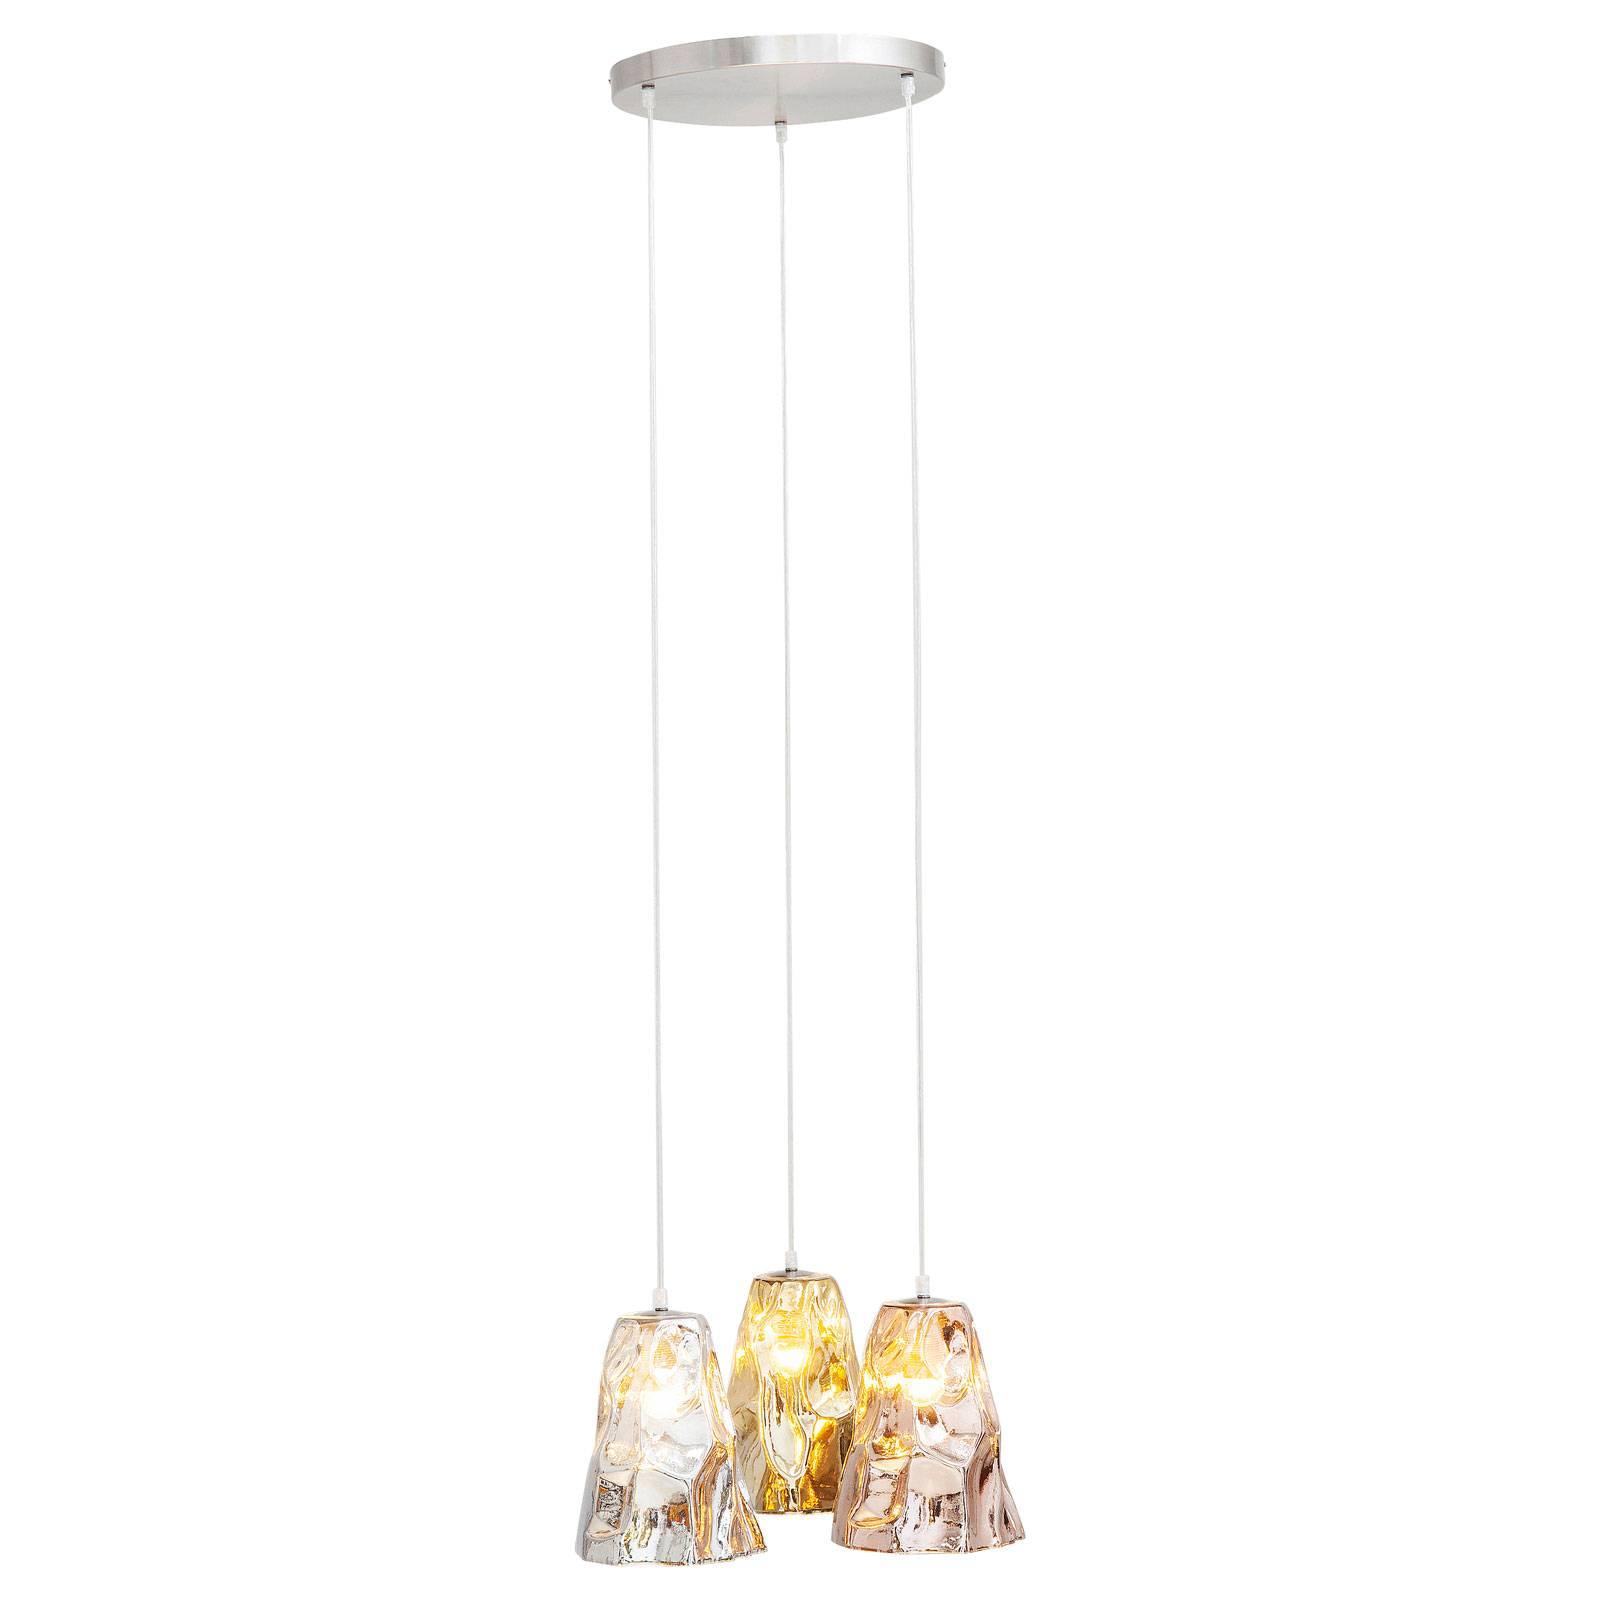 KARE Crumble Tricolore hanglamp, Ø 57 cm